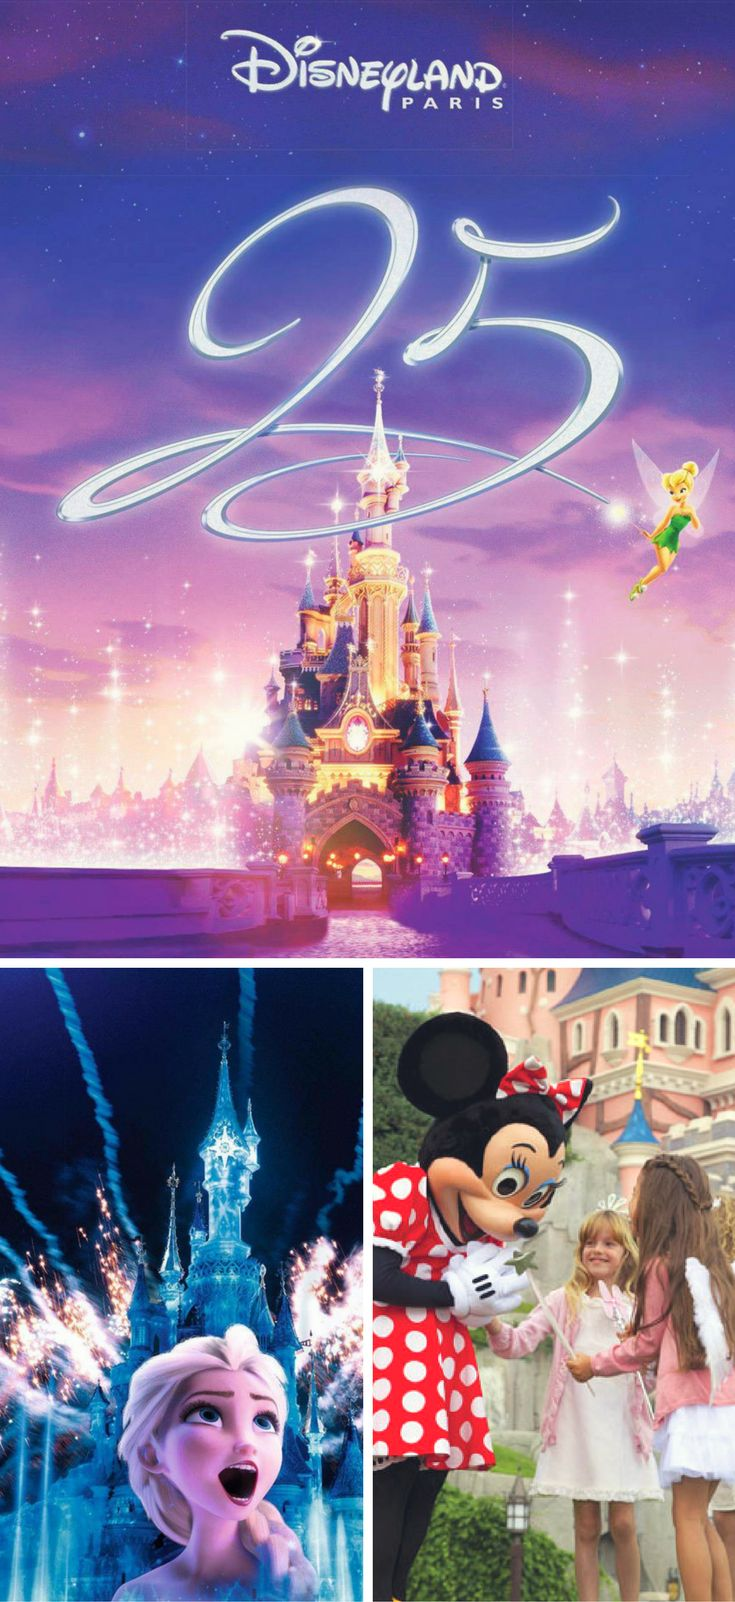 Disneyland Paris Restaurant Discount Vouchers